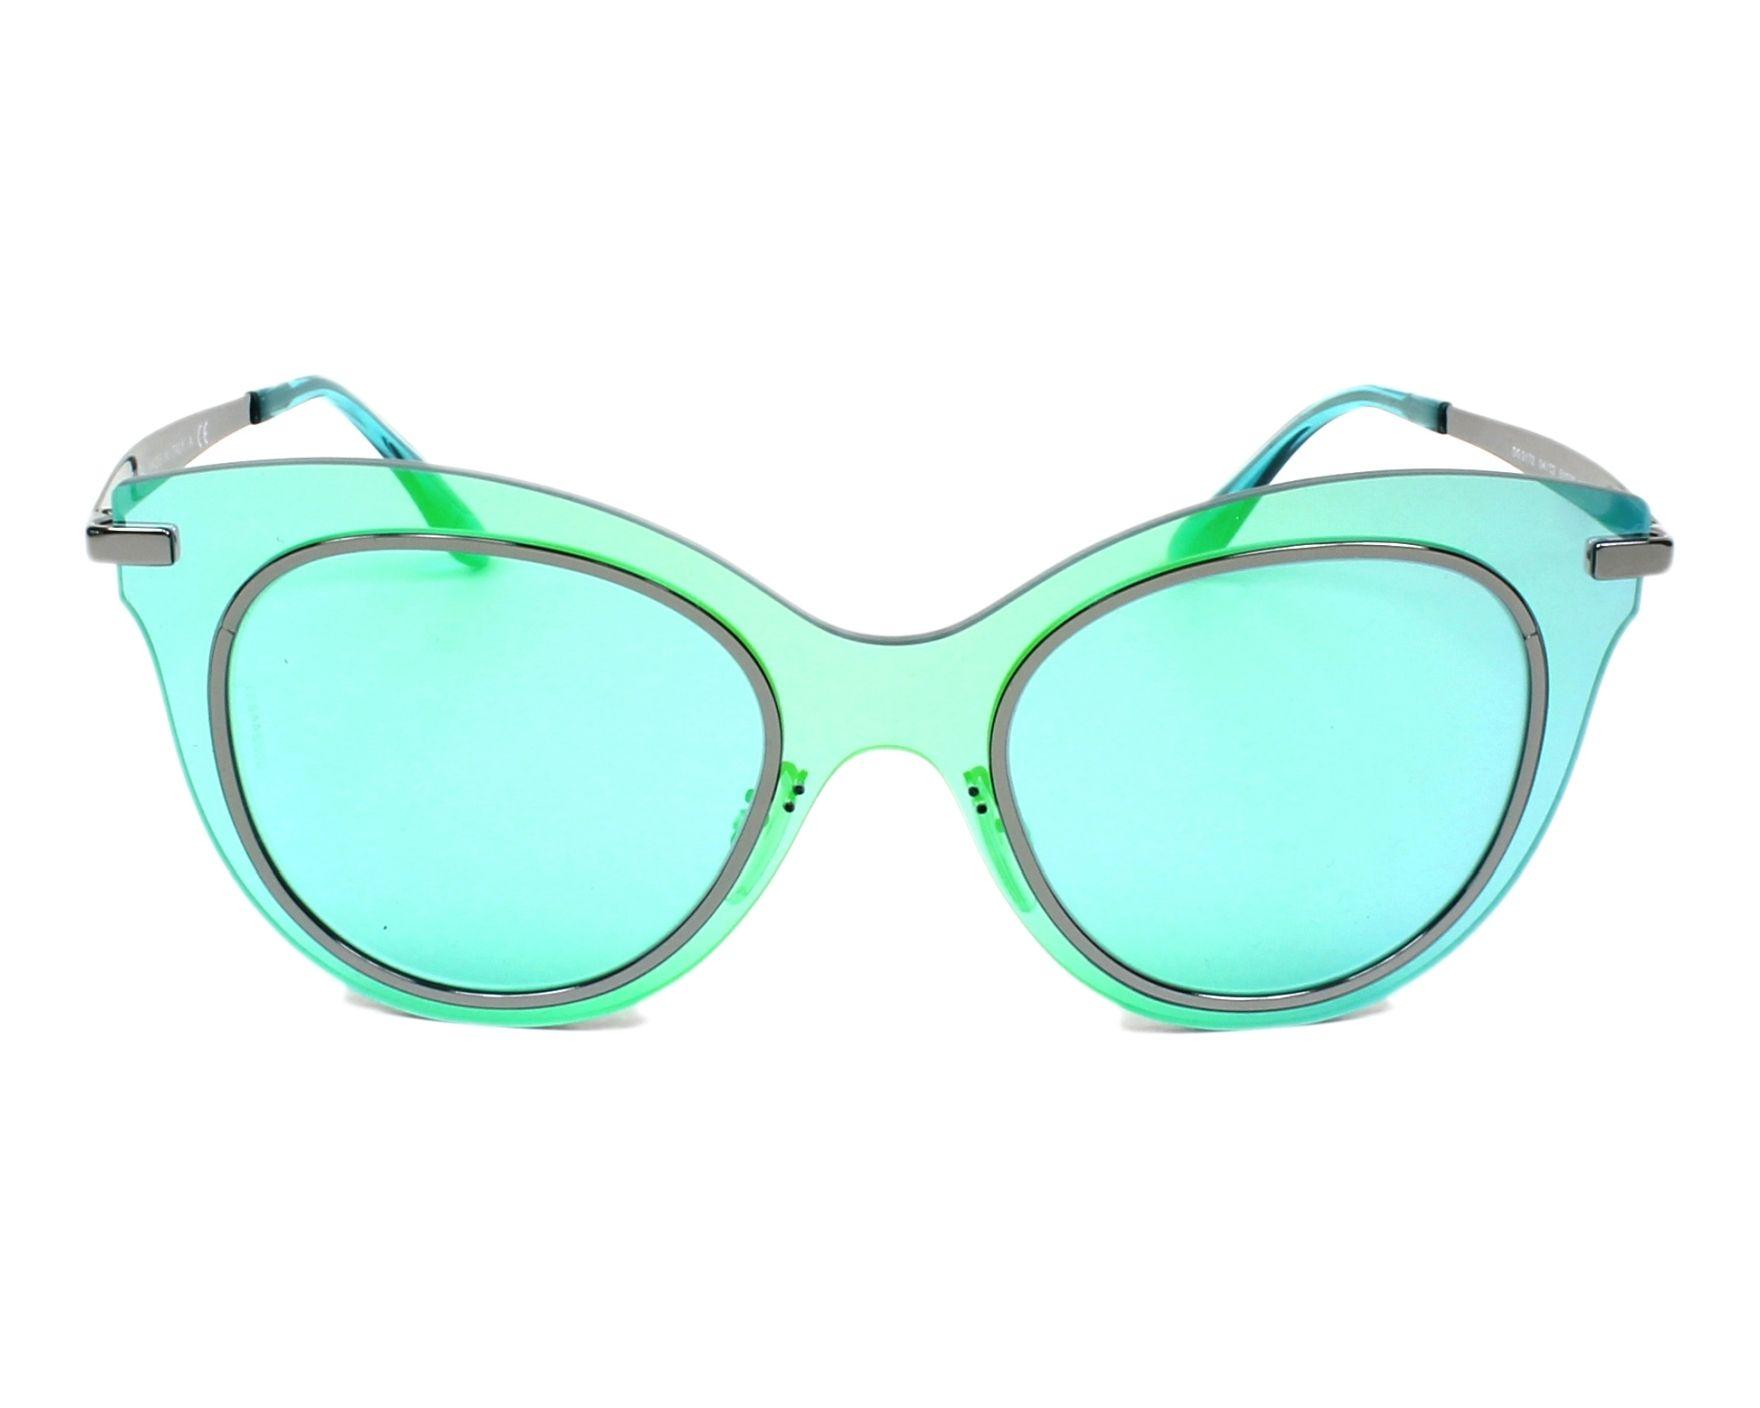 lunettes de soleil dolce gabbana dg 2172 04 c2 gunmetal. Black Bedroom Furniture Sets. Home Design Ideas